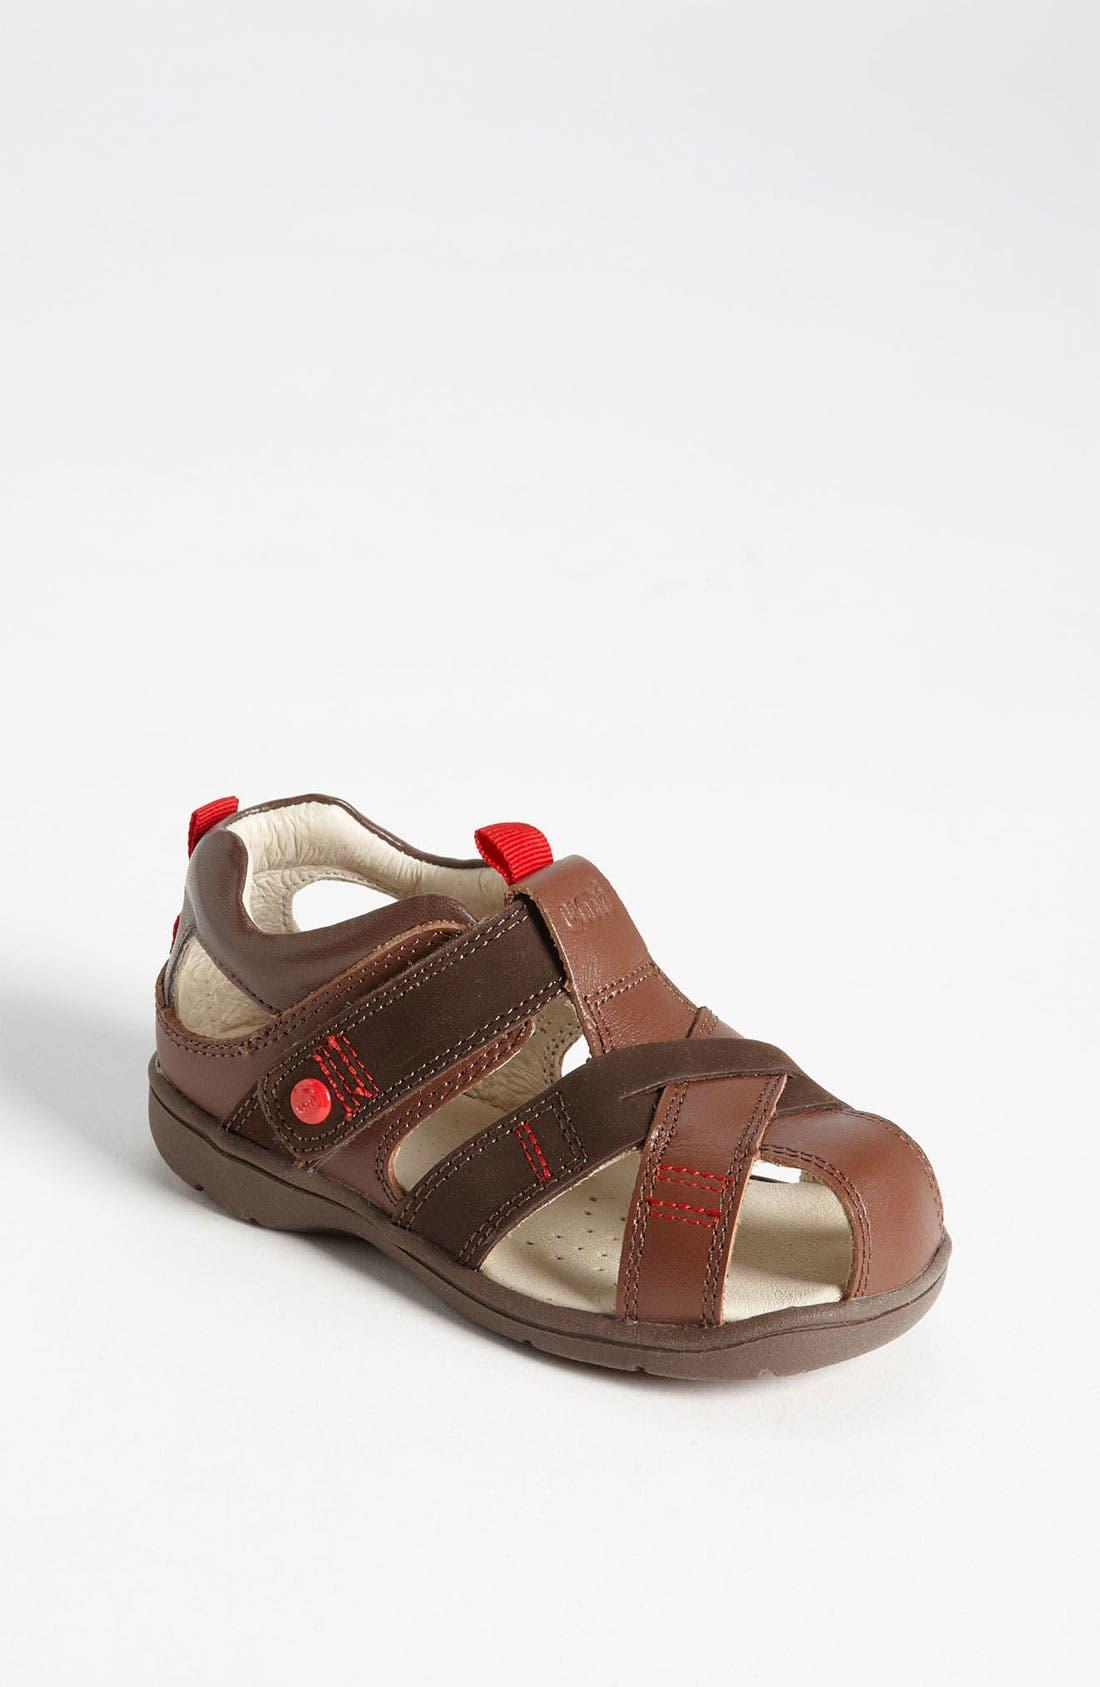 Alternate Image 1 Selected - Umi 'Trieste' Fisherman Sandal (Walker & Toddler)